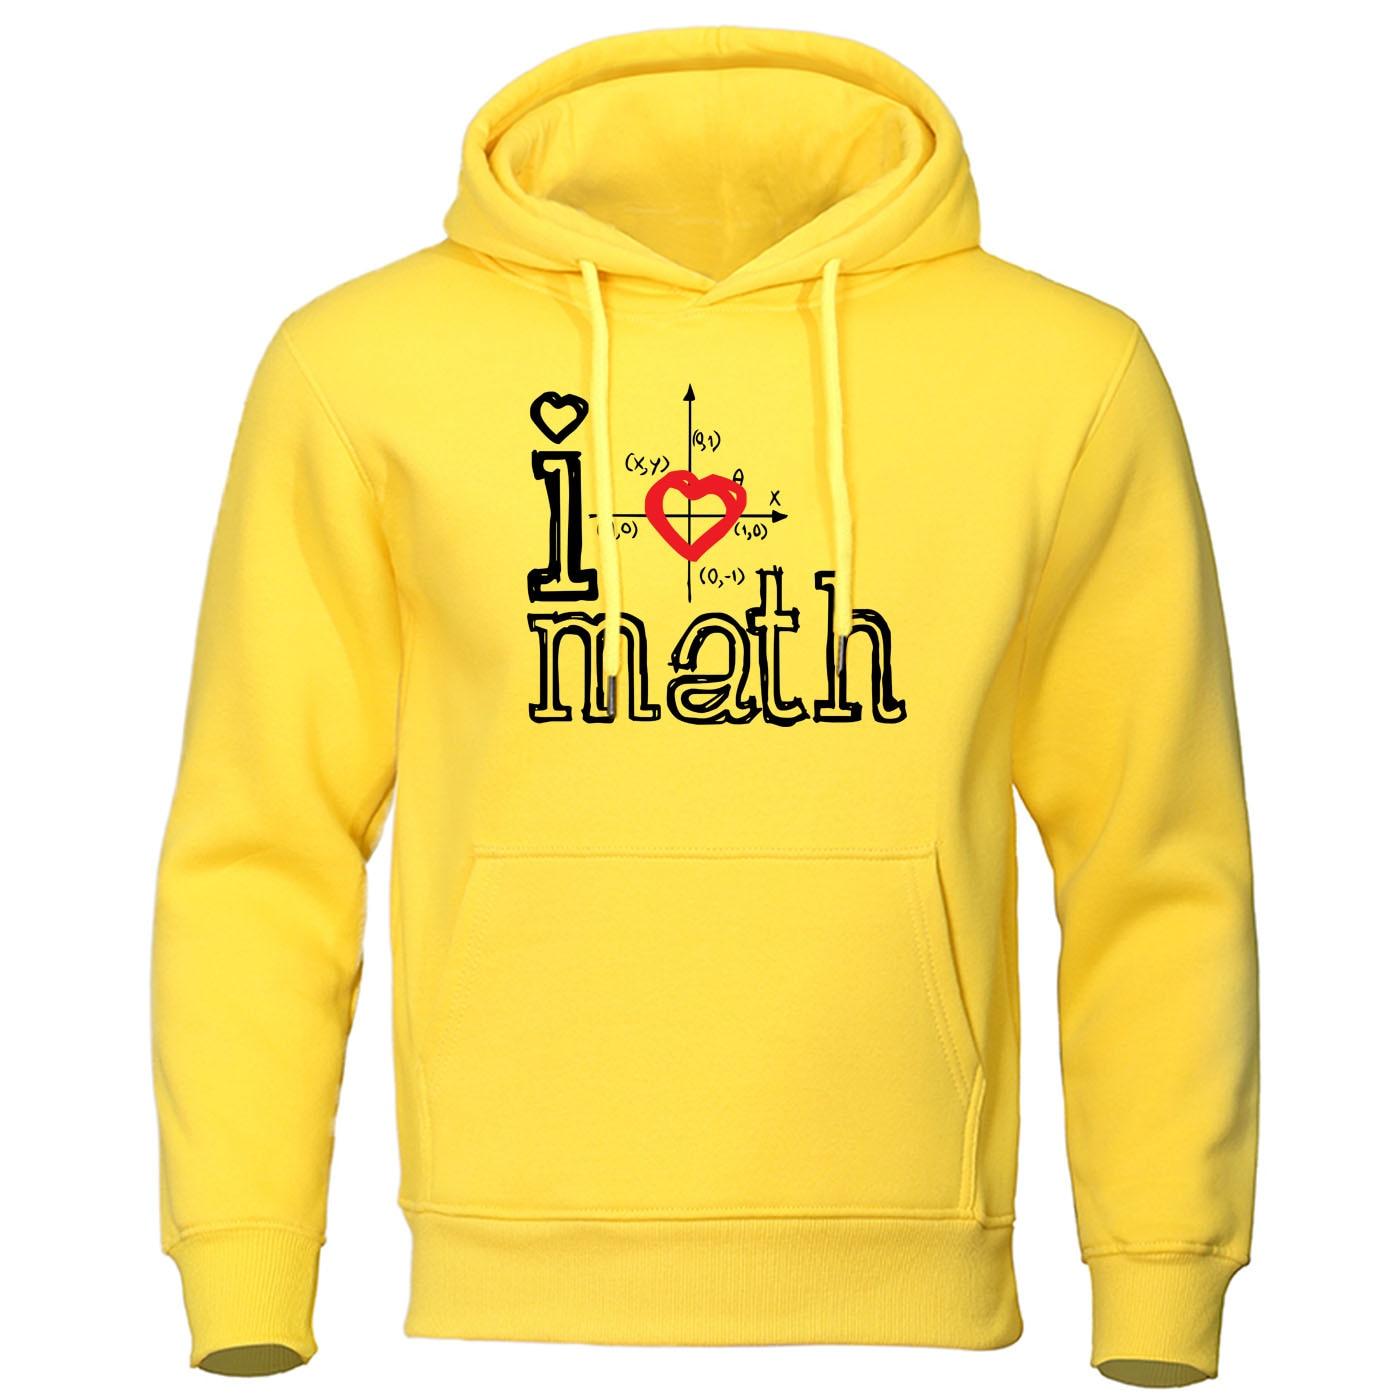 I Love Math Hoodie Loose Brand Clothing Creative Mathematical Hoodies Logo Print Pullover Autumn Warm Sweatshirt Mens Streetwear